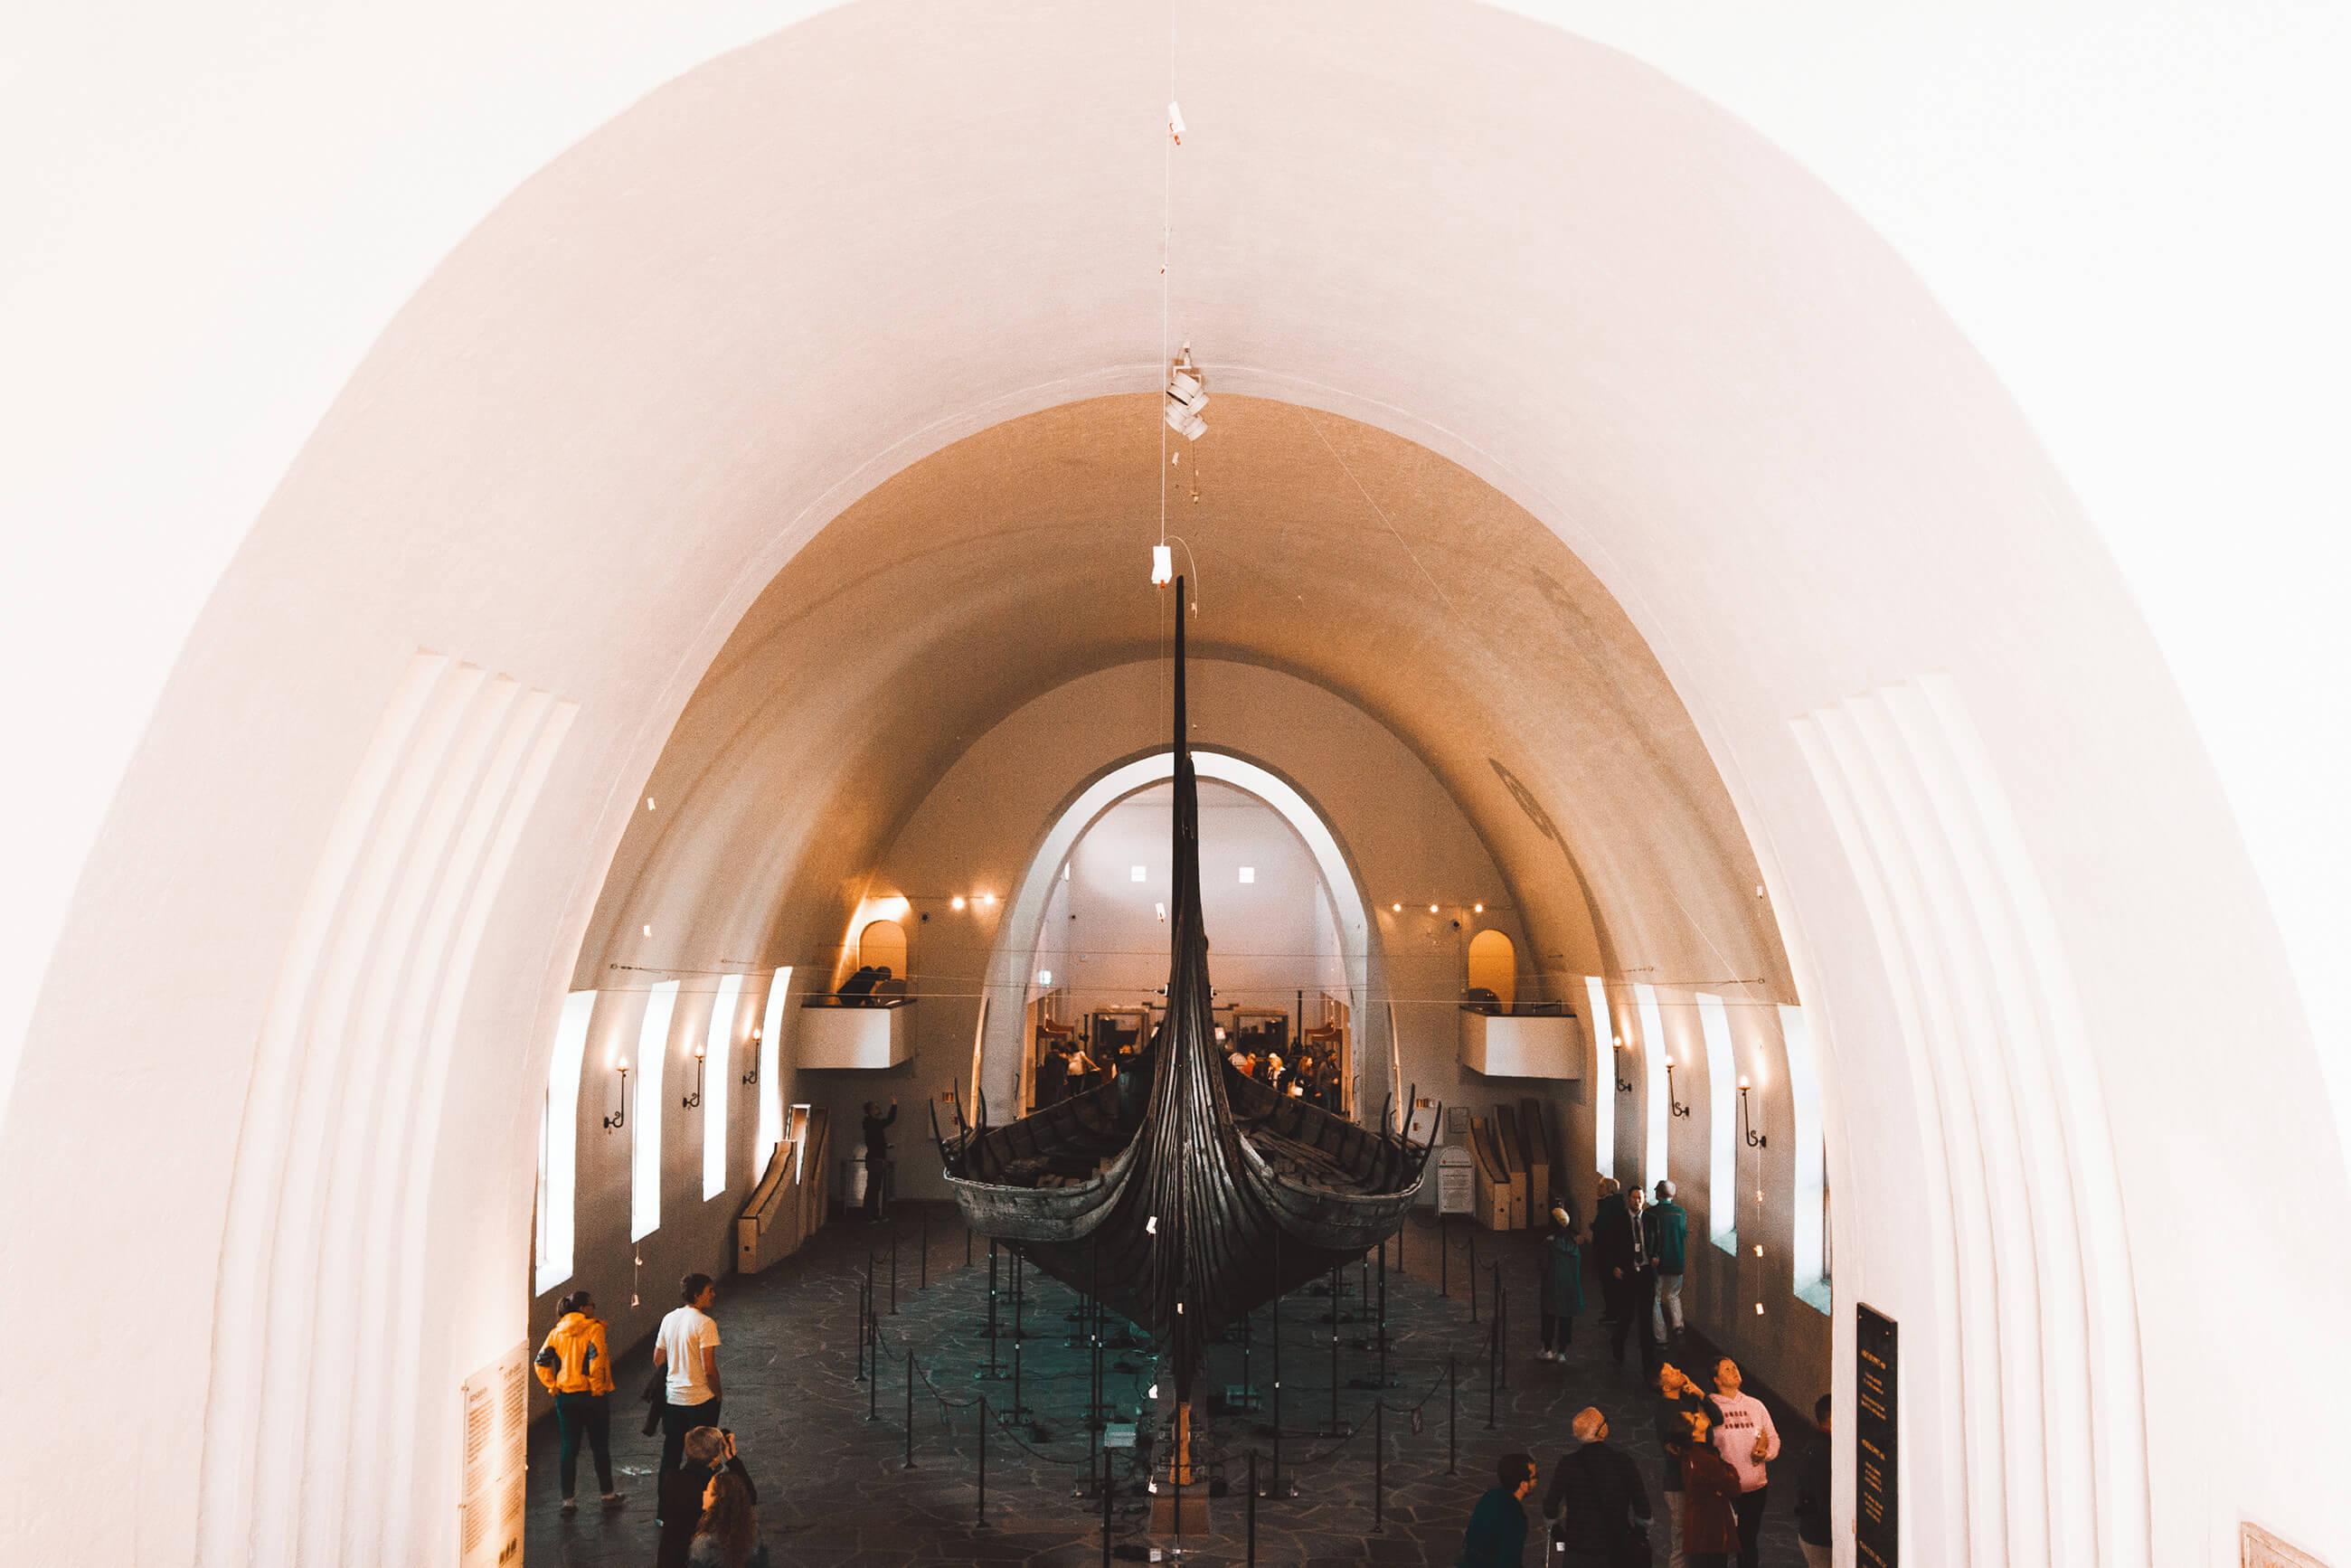 https://bubo.sk/uploads/galleries/5039/zuzkahabekova_norsko_vikingske-1-2.jpg